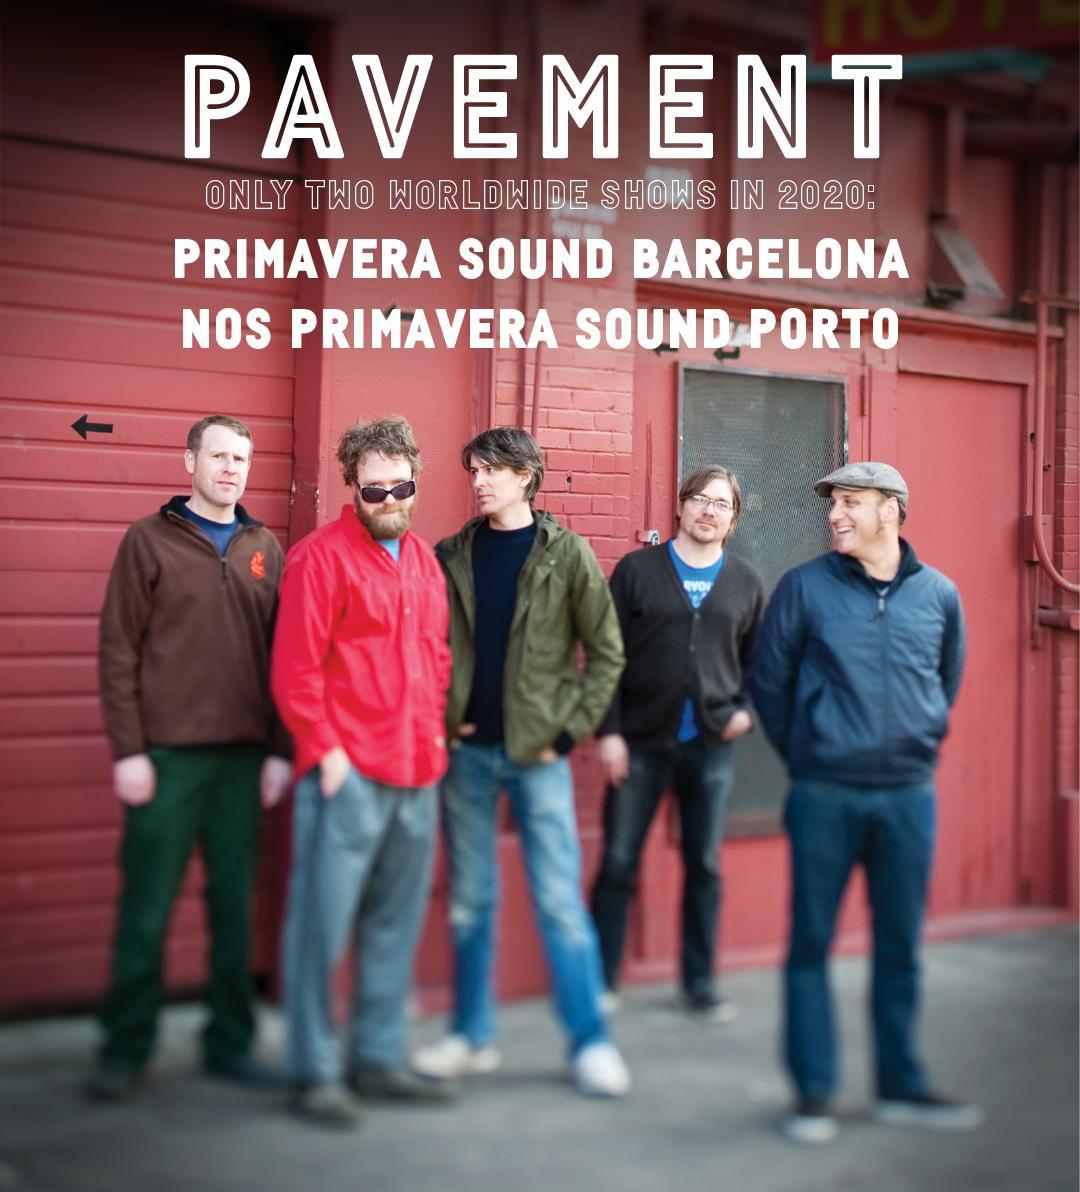 Pavement reunion shows